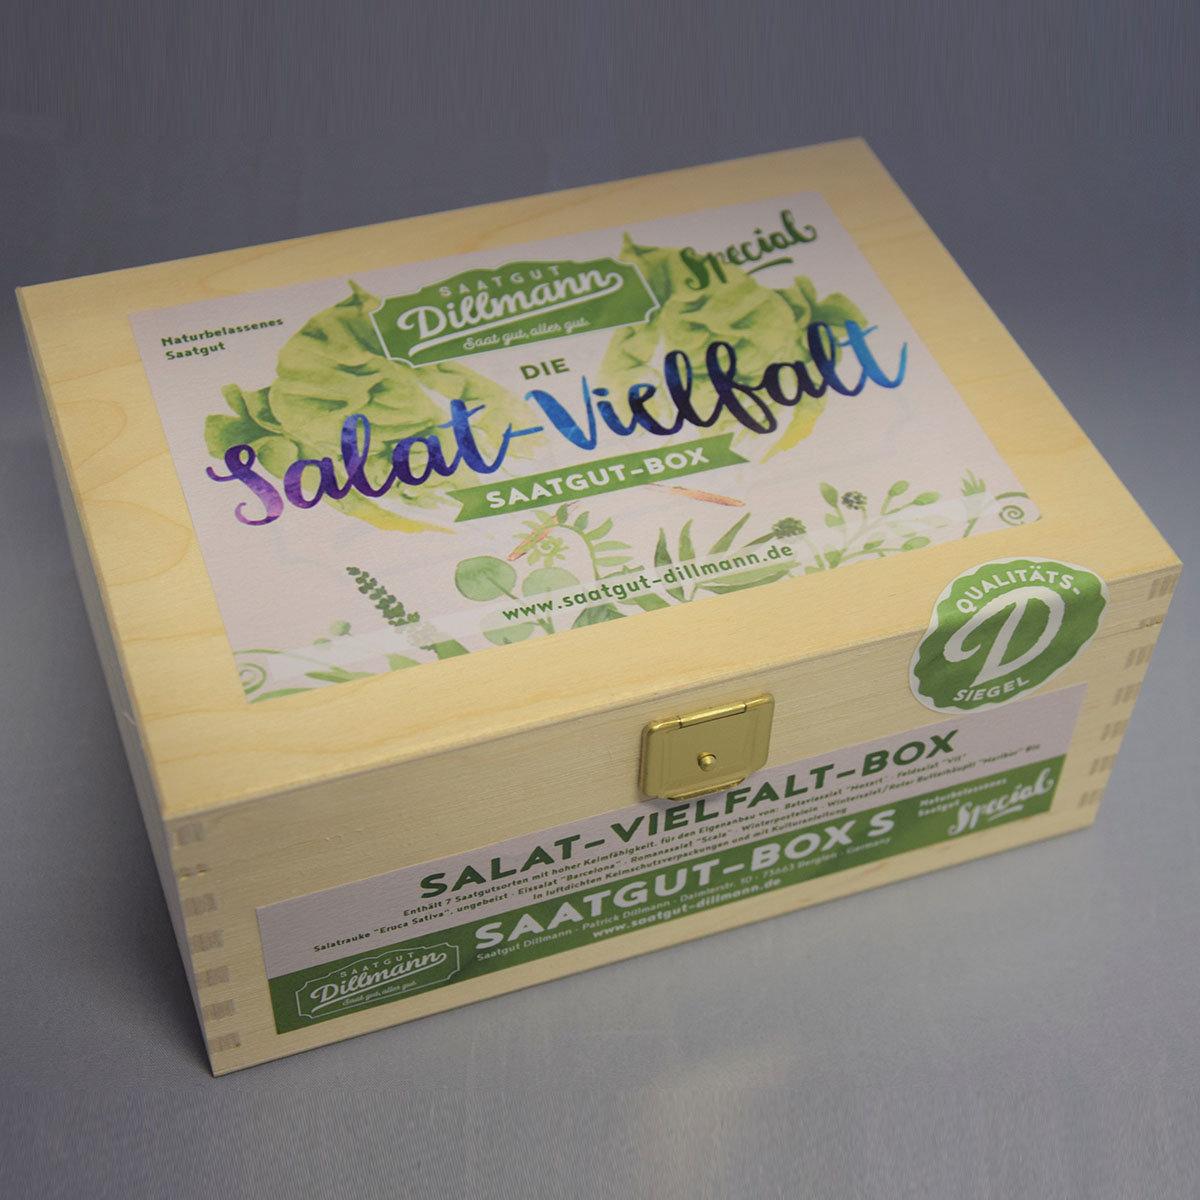 Saatgut-Holzbox Salatvielfalt, 7 Saatgut-Sorten